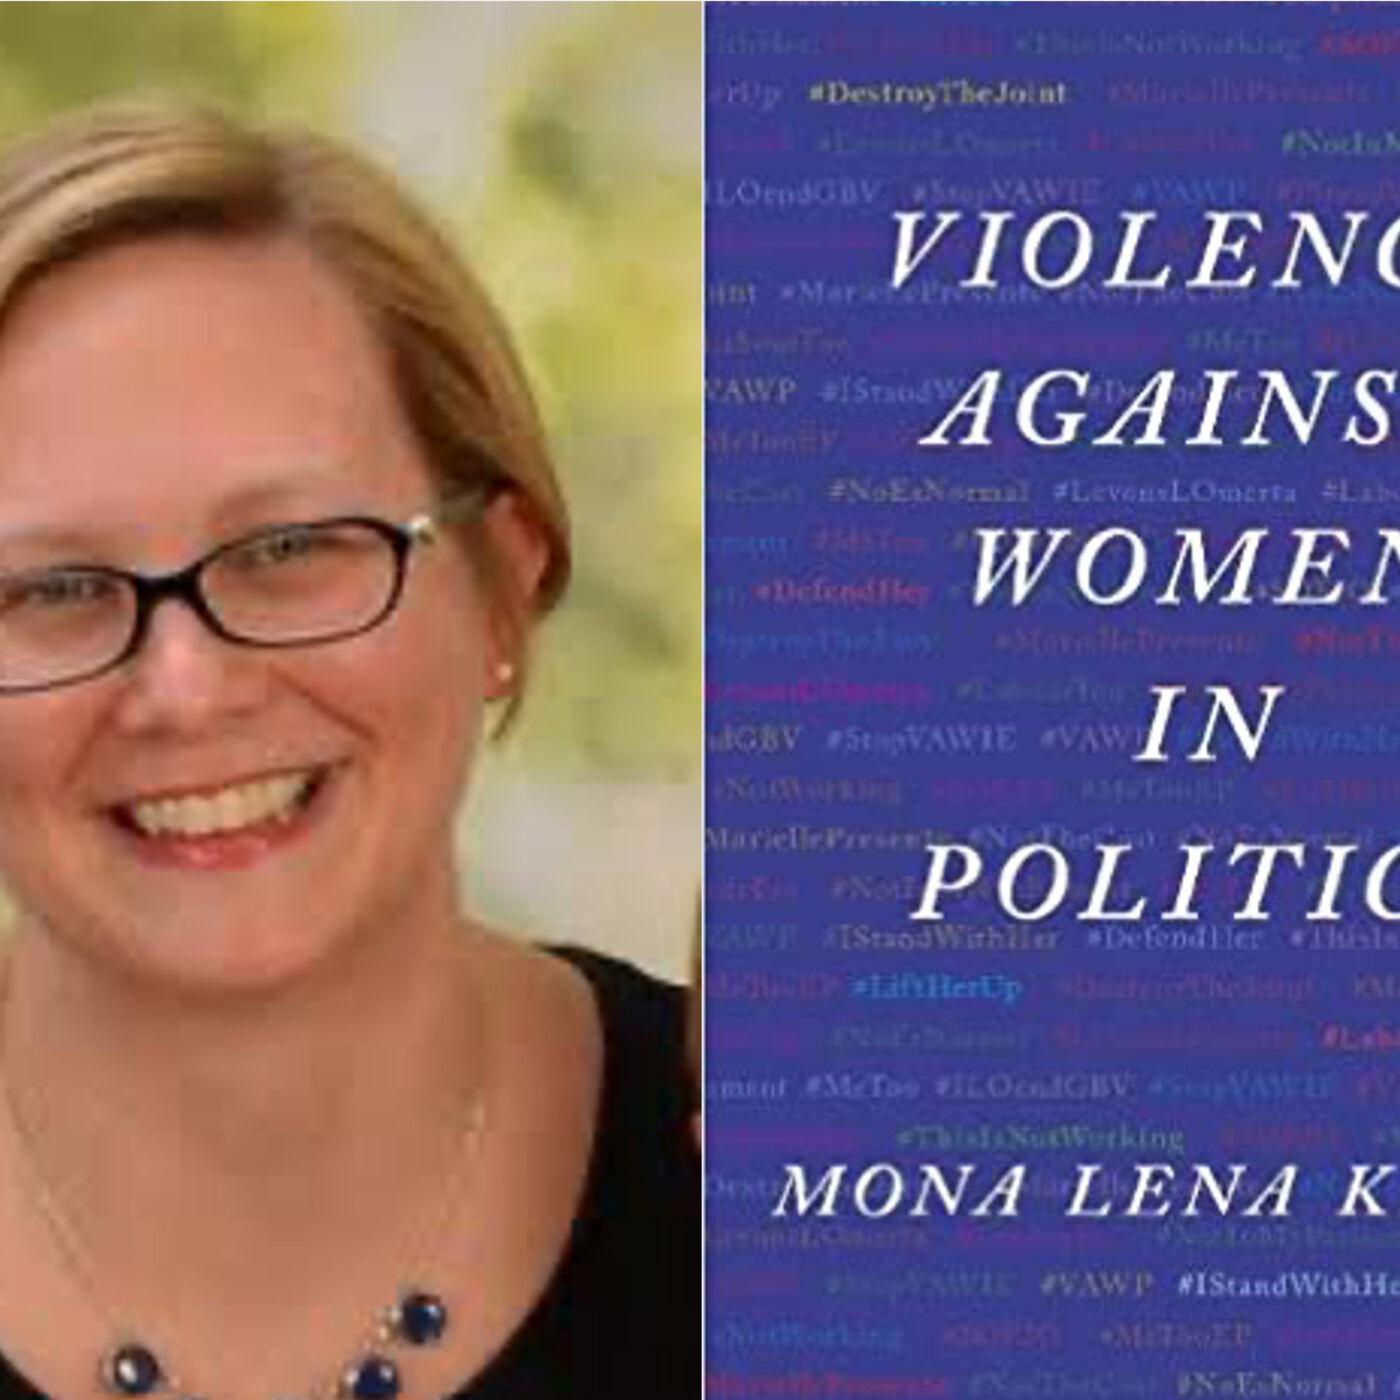 17. Mona Krook on violence against women in politics